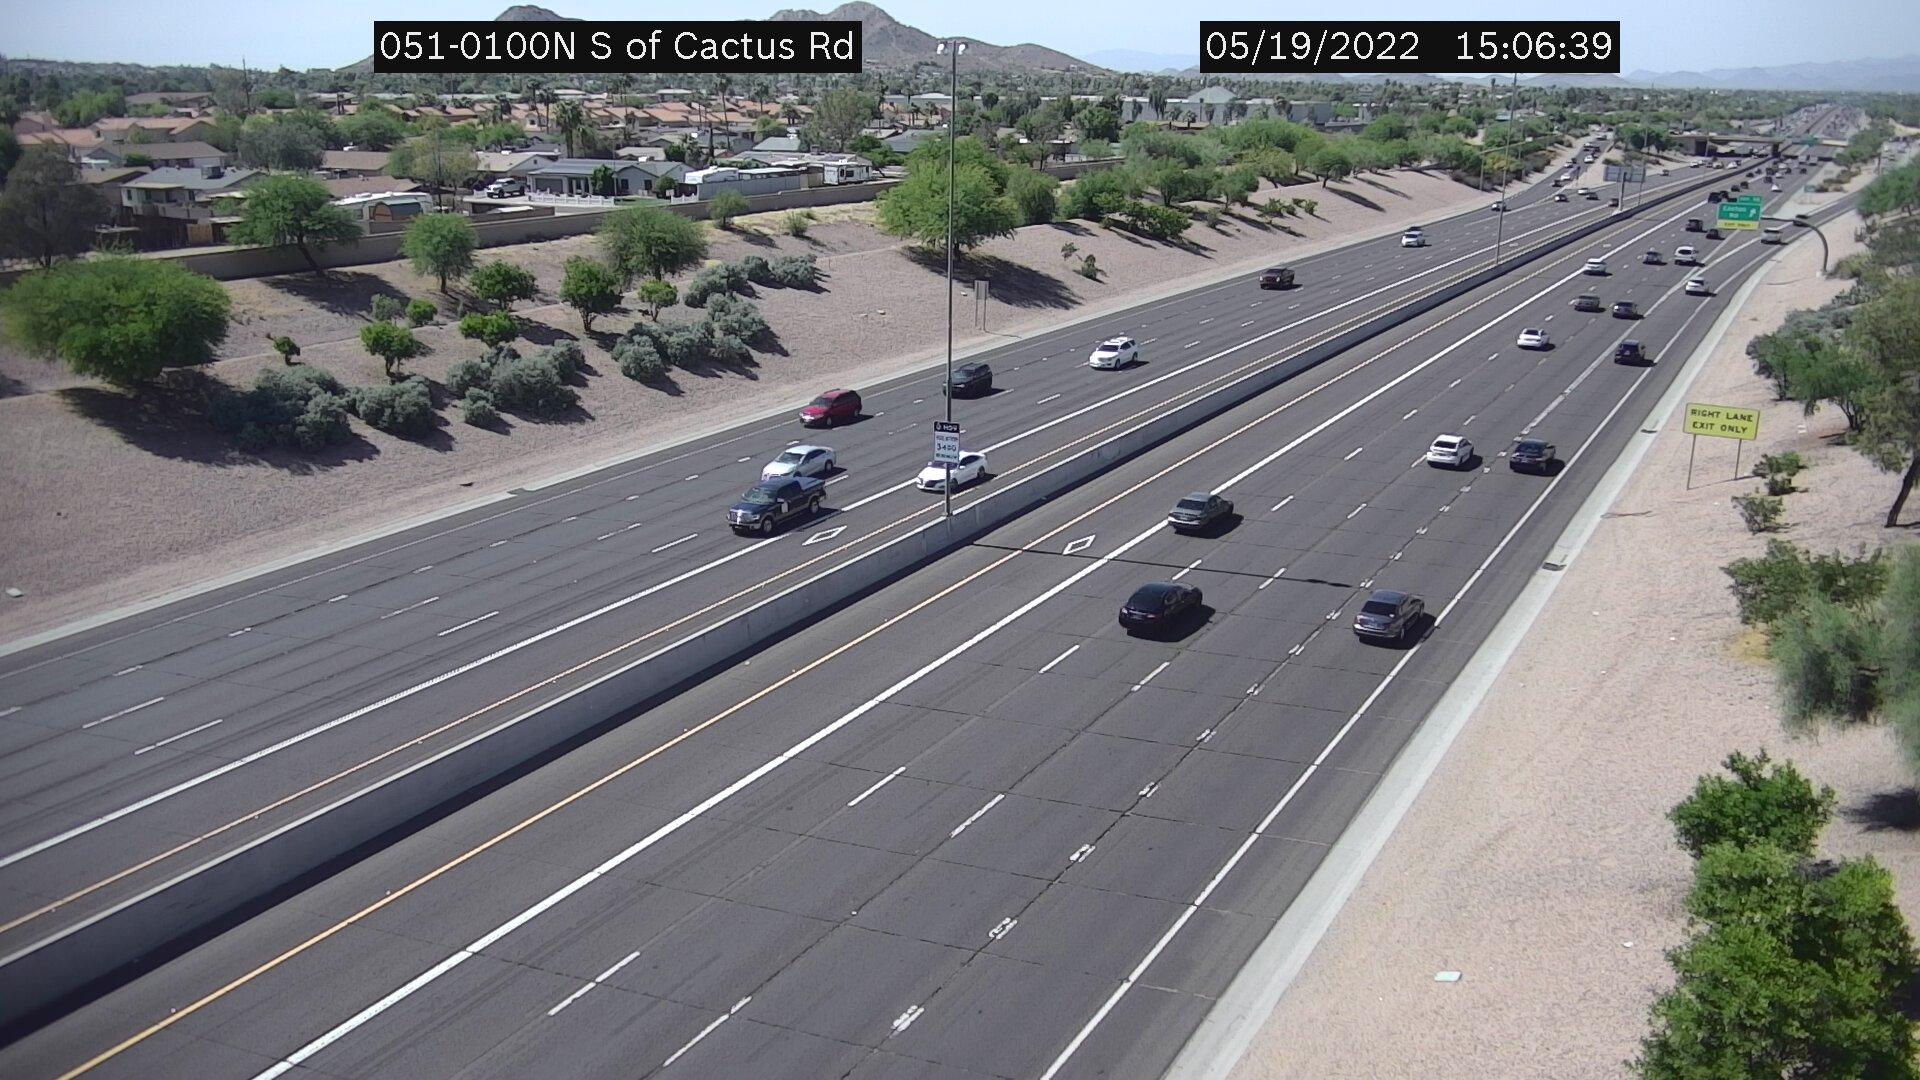 S of Cactus NB (SR51) (086) - Phoenix and Arizona